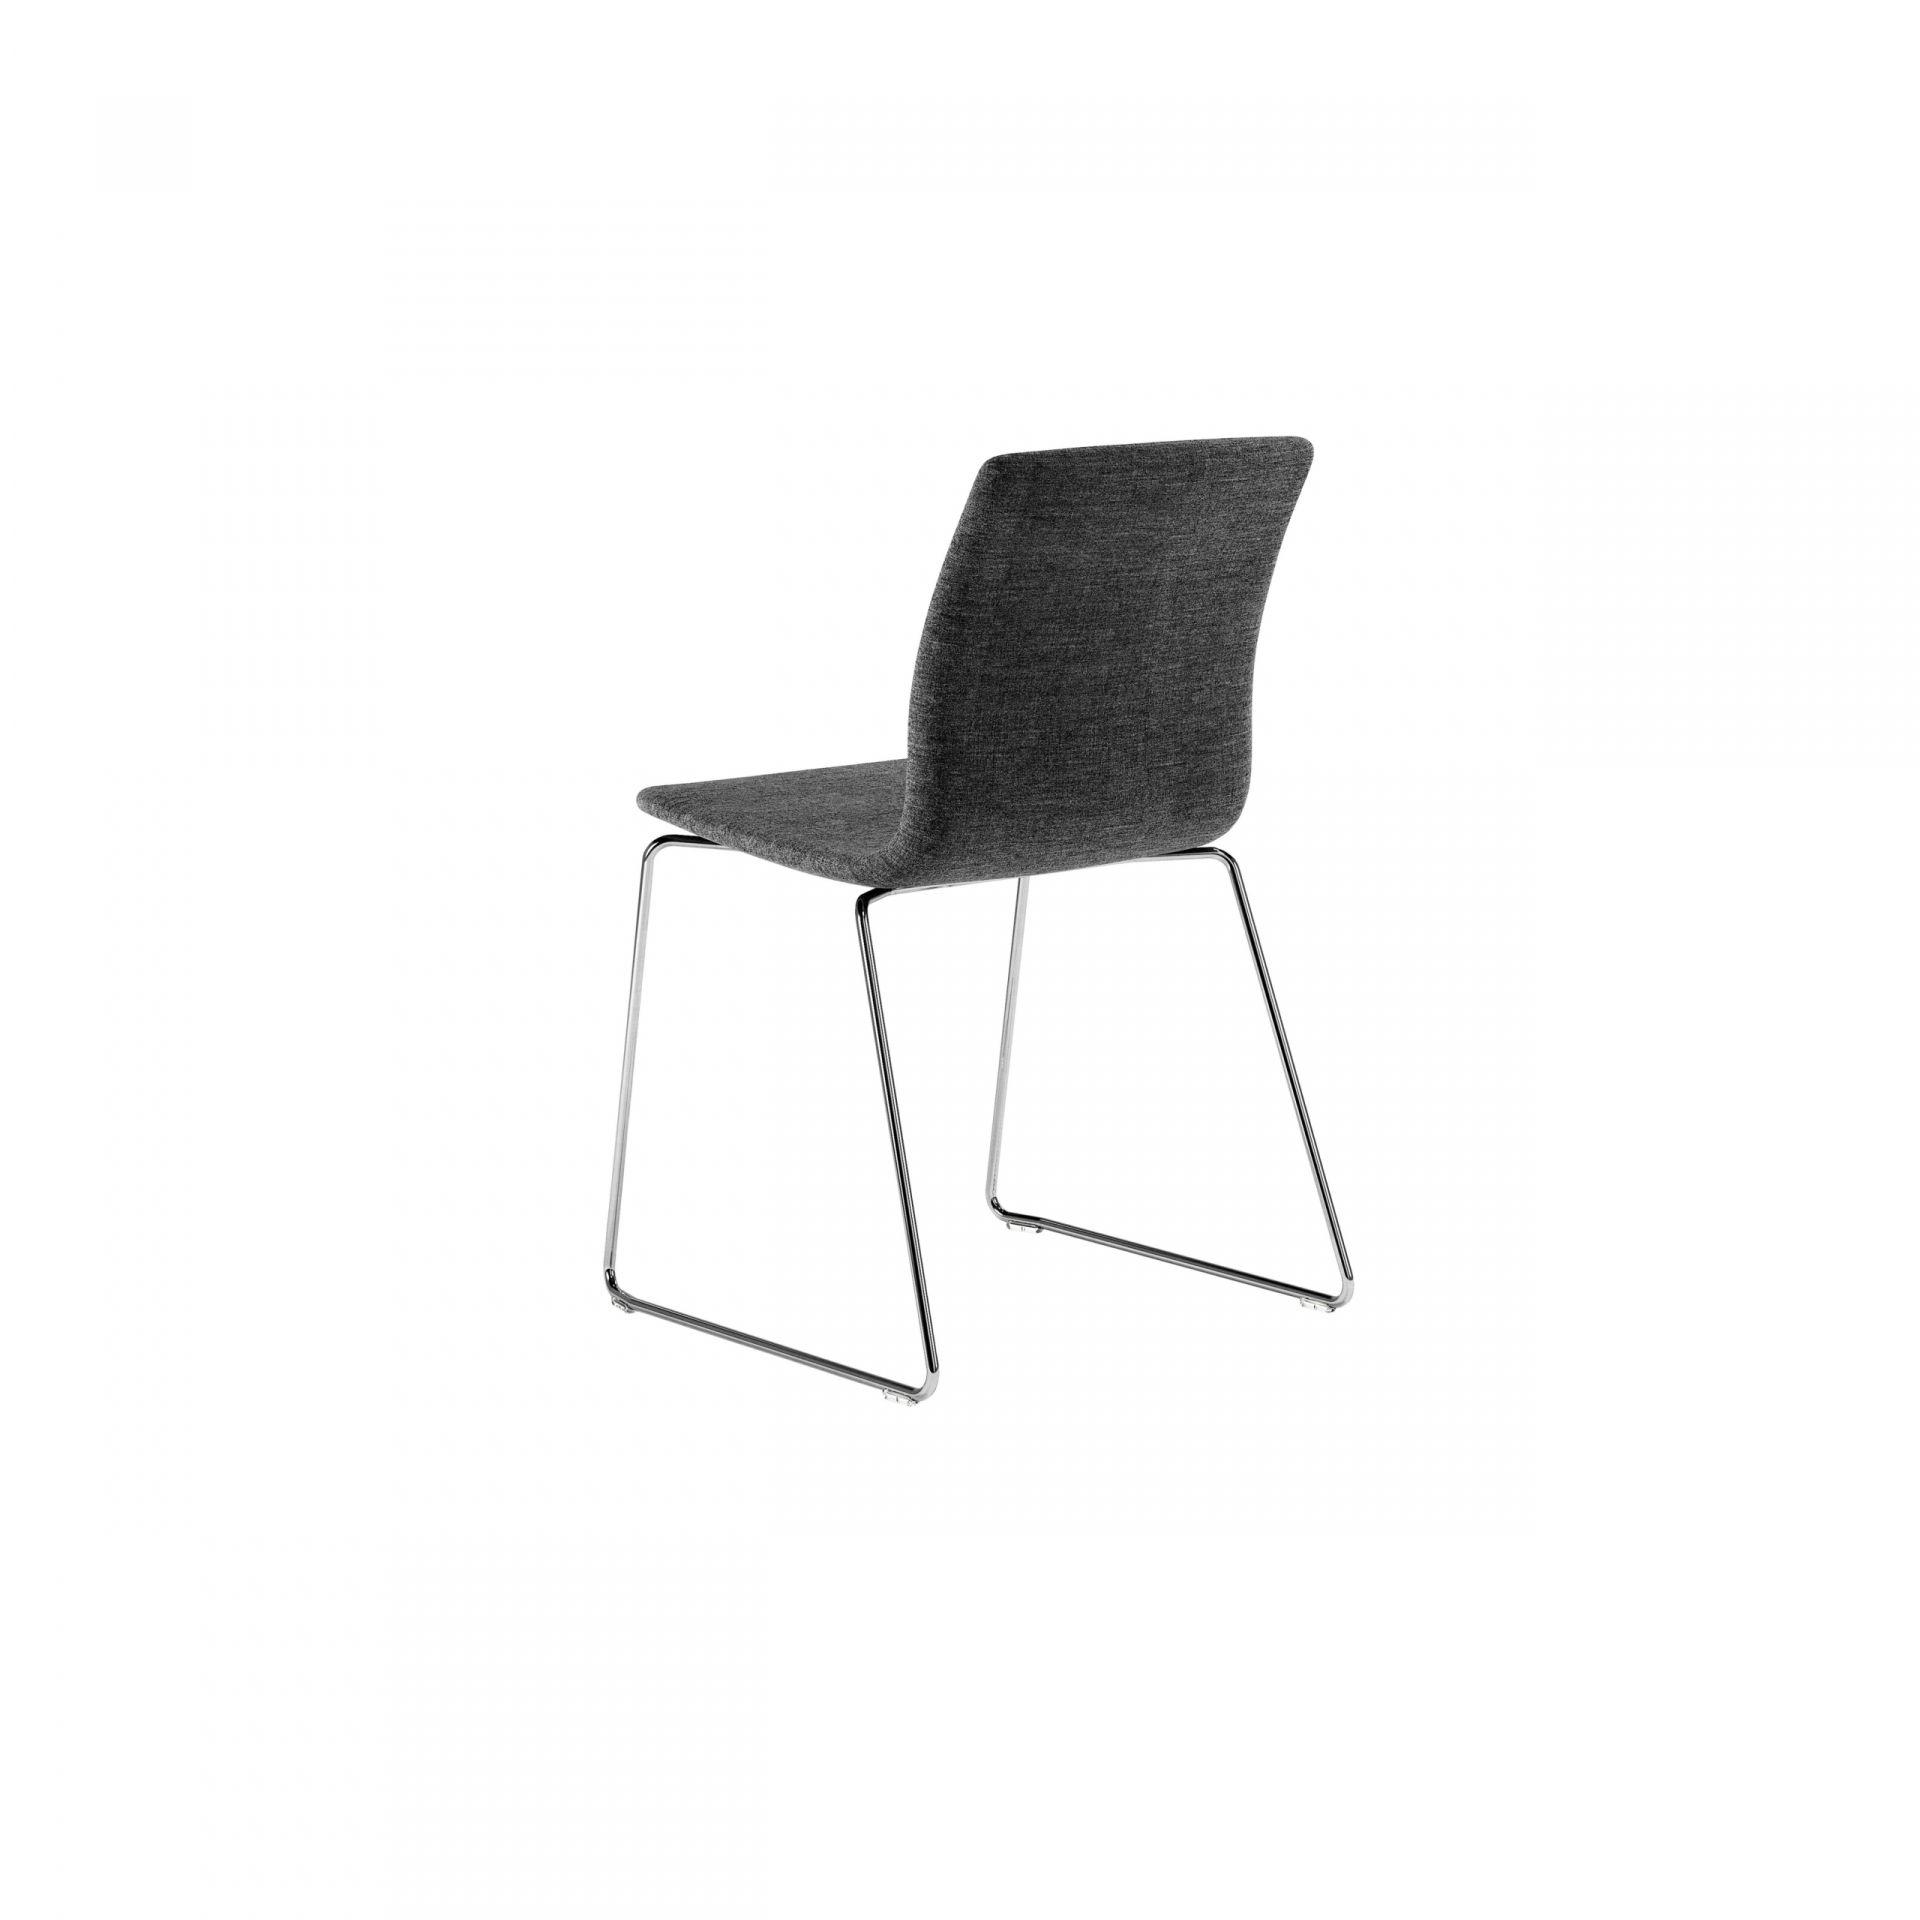 Nova Chair with sledge product image 3